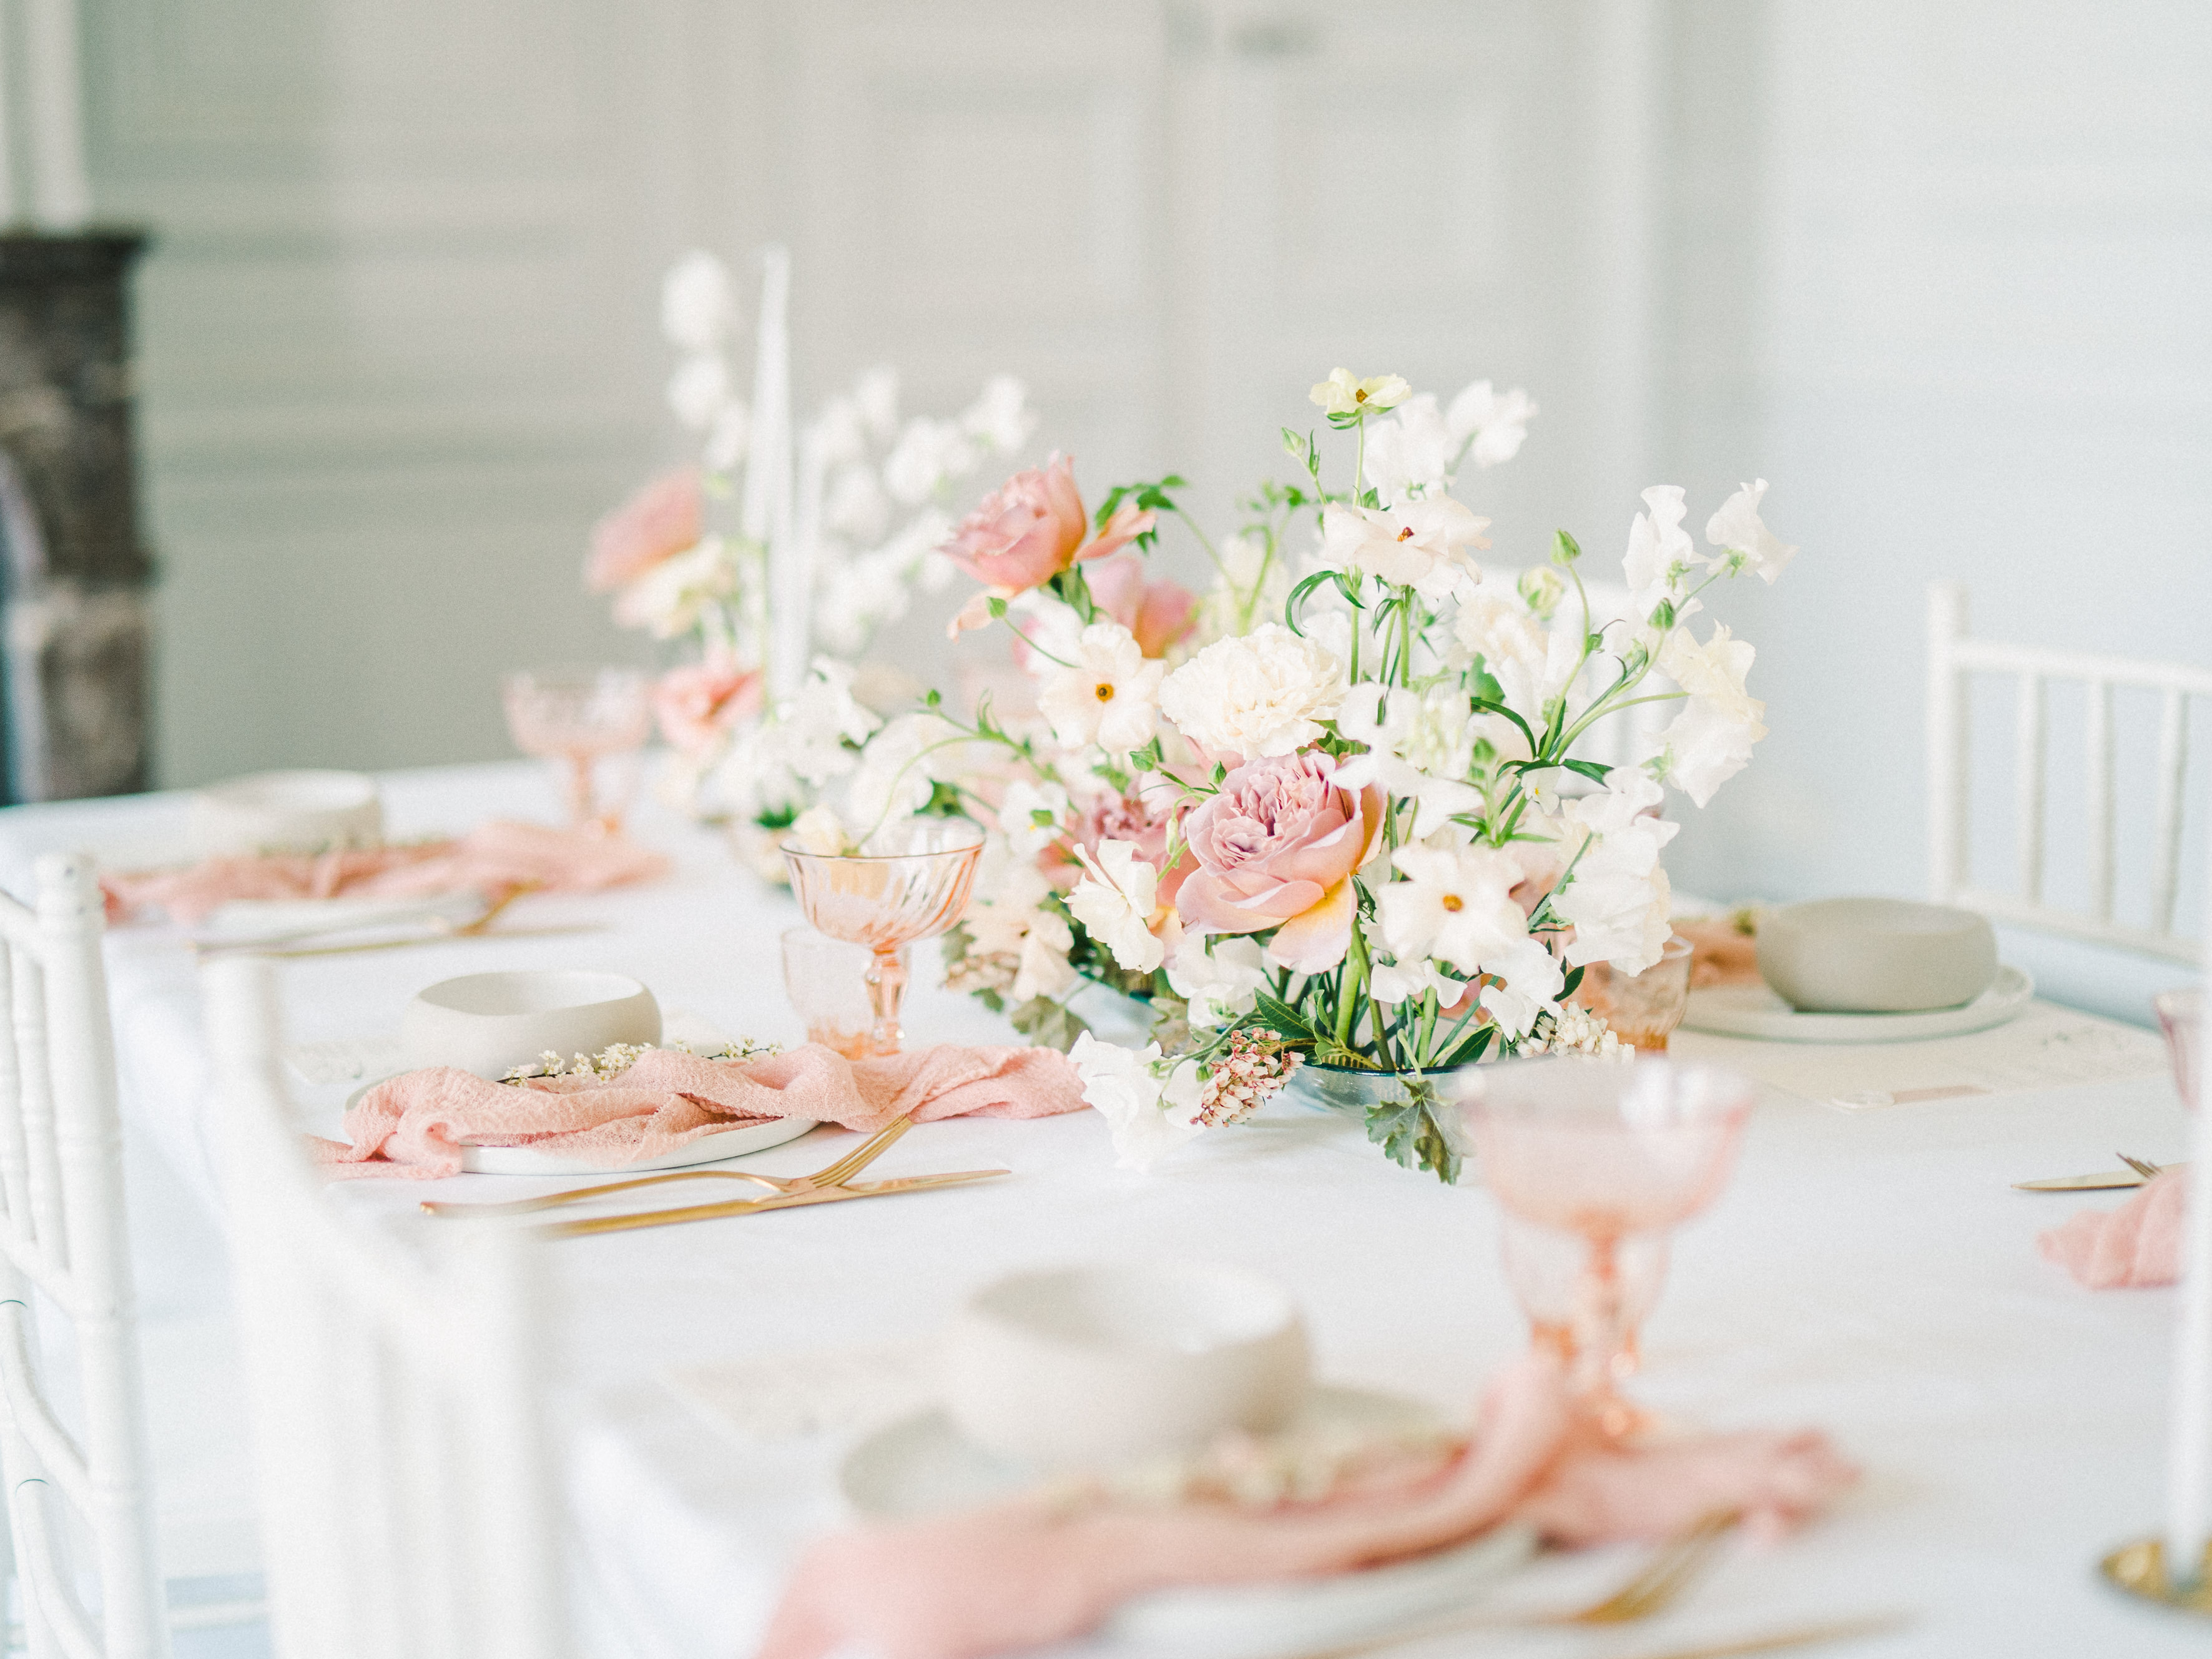 Elegant Whimsical French Chateau Wedding Inspiration Romain Vaucher 14